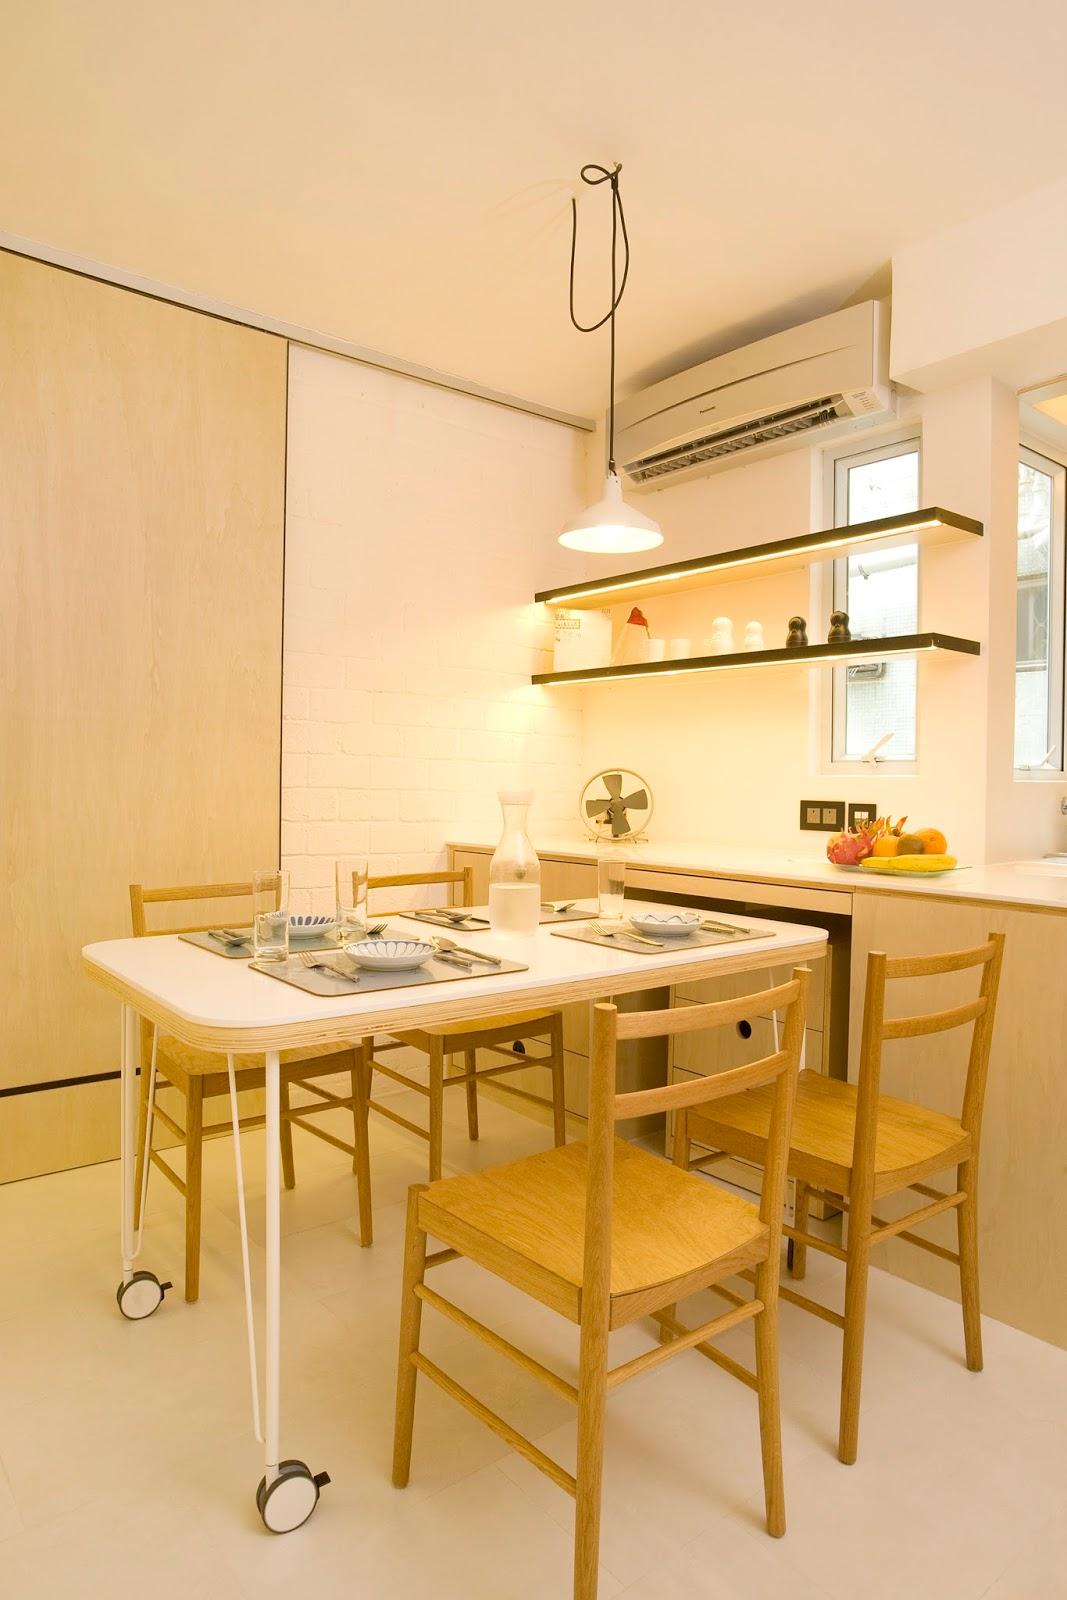 hong kong interior design tips & ideas | clifton leung: 6 ways to